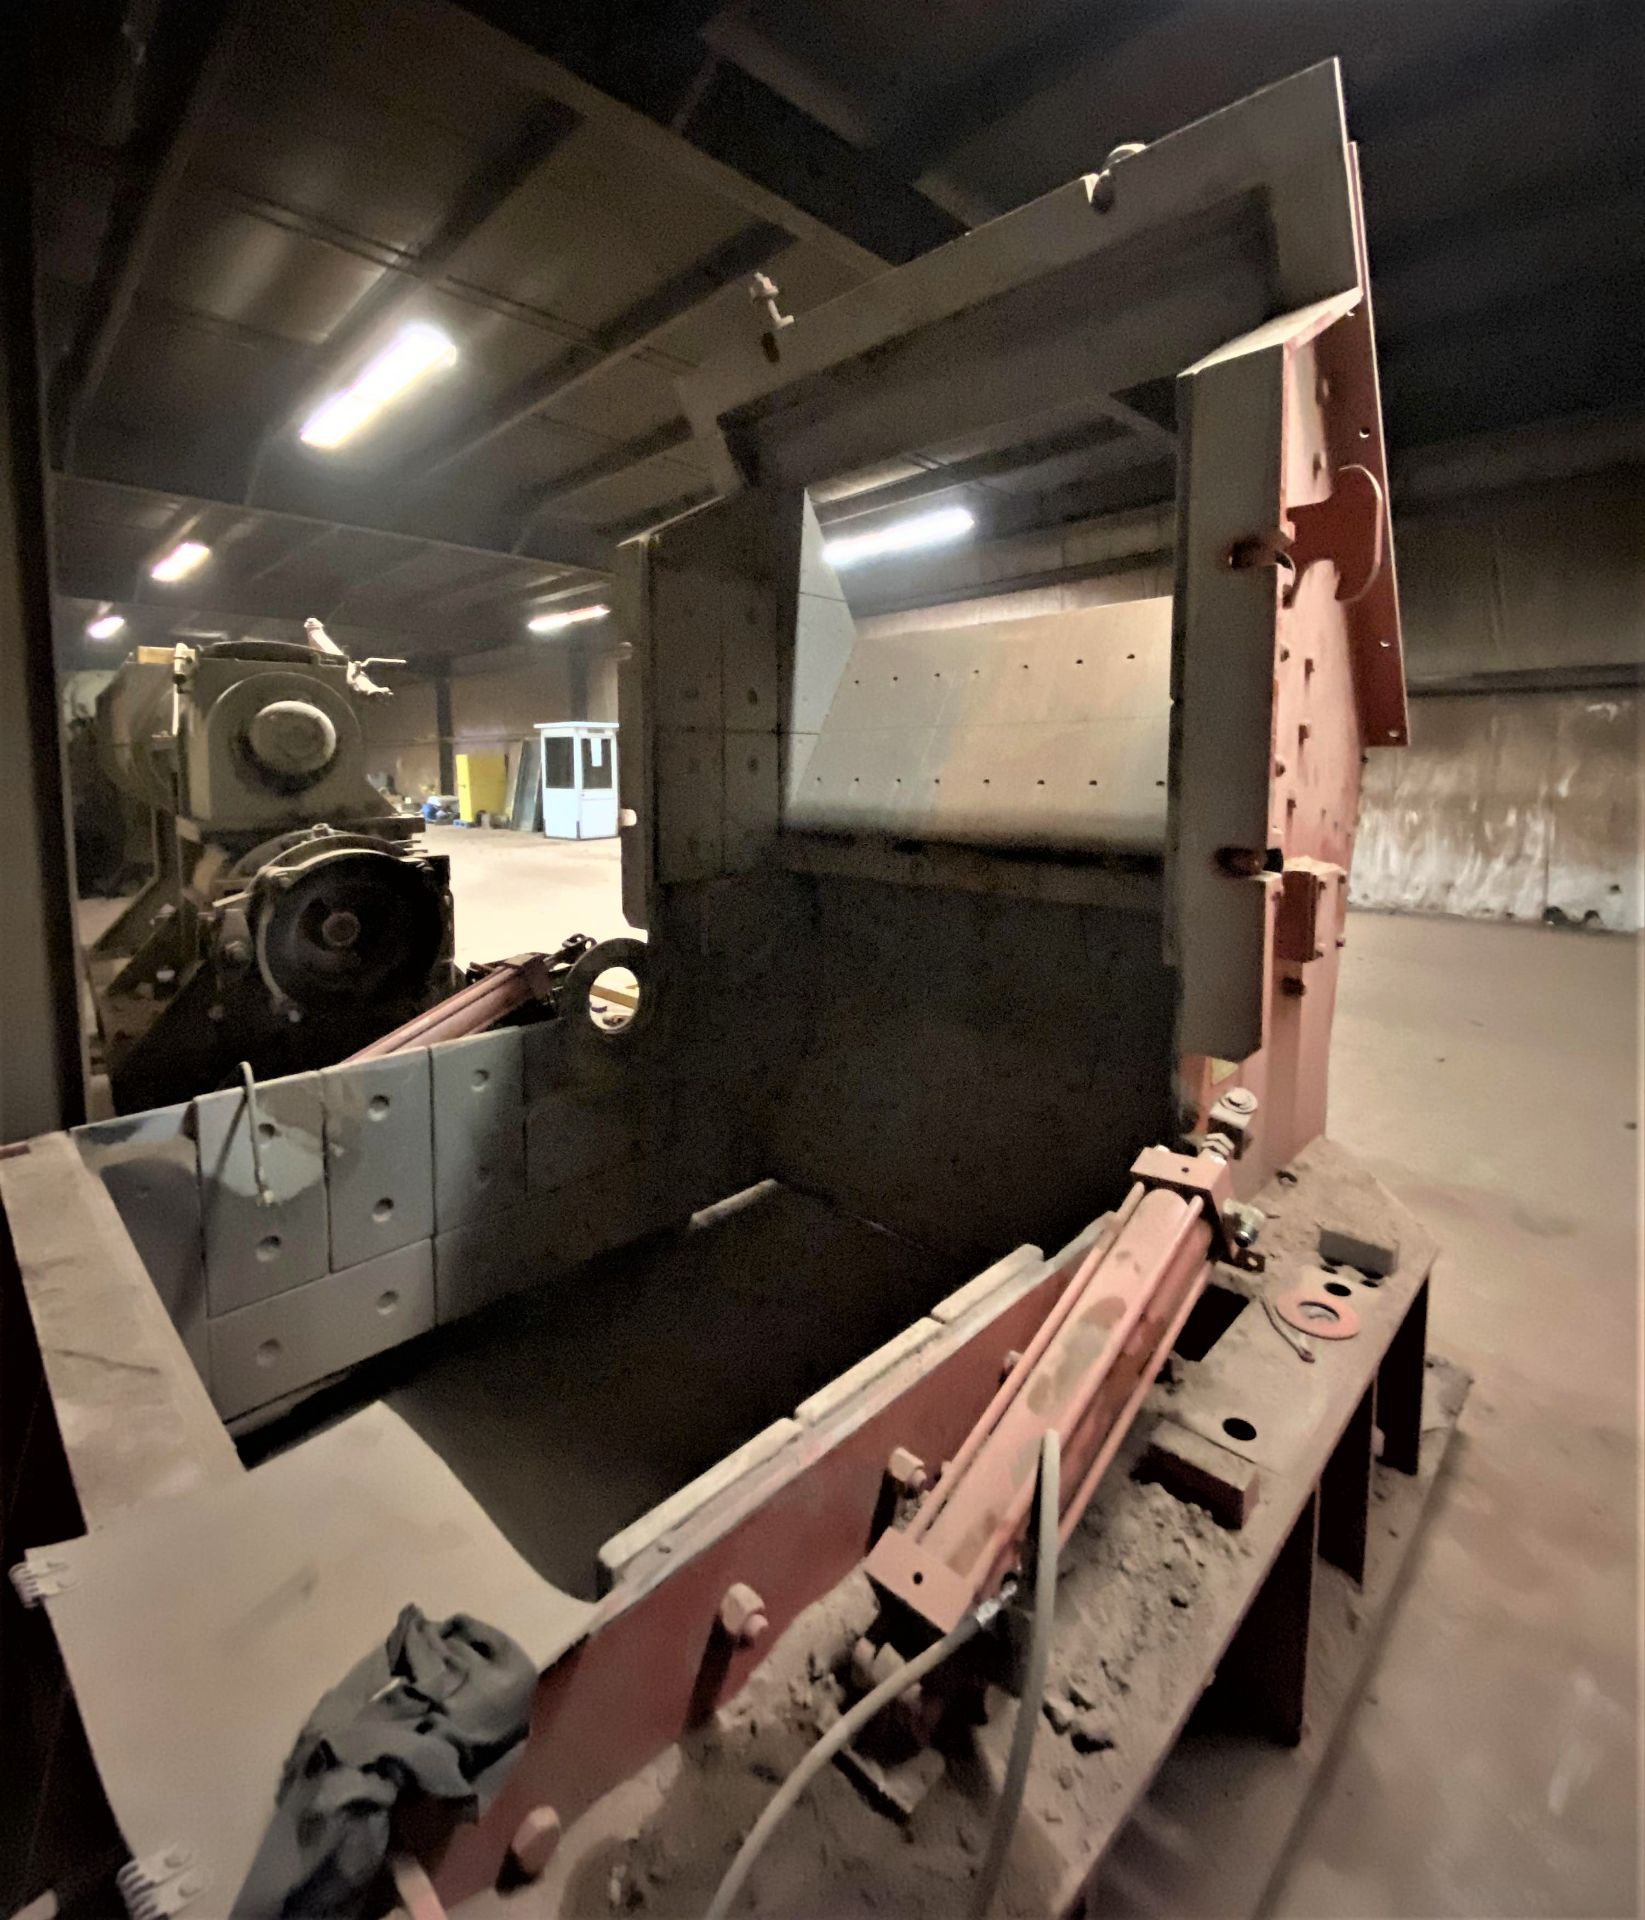 HAZEMAG IMPACT CRUSHER, MODEL 1315, 60'' DIAMETER ROTOR, 60'' WIDE, 575V, 450 HP - Image 4 of 25